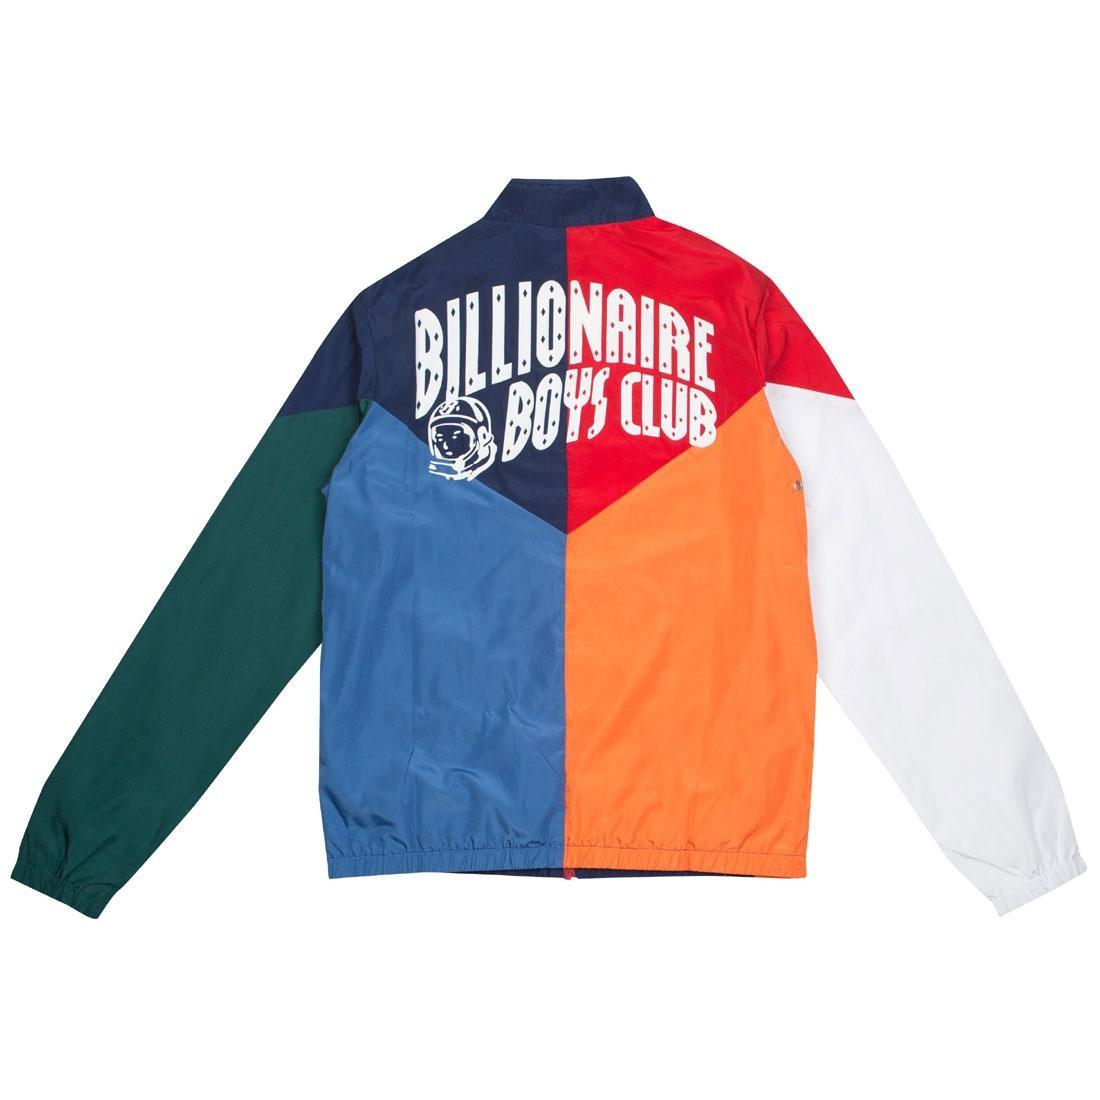 Billionaire Boys Club Men Block And Brake Jacket white